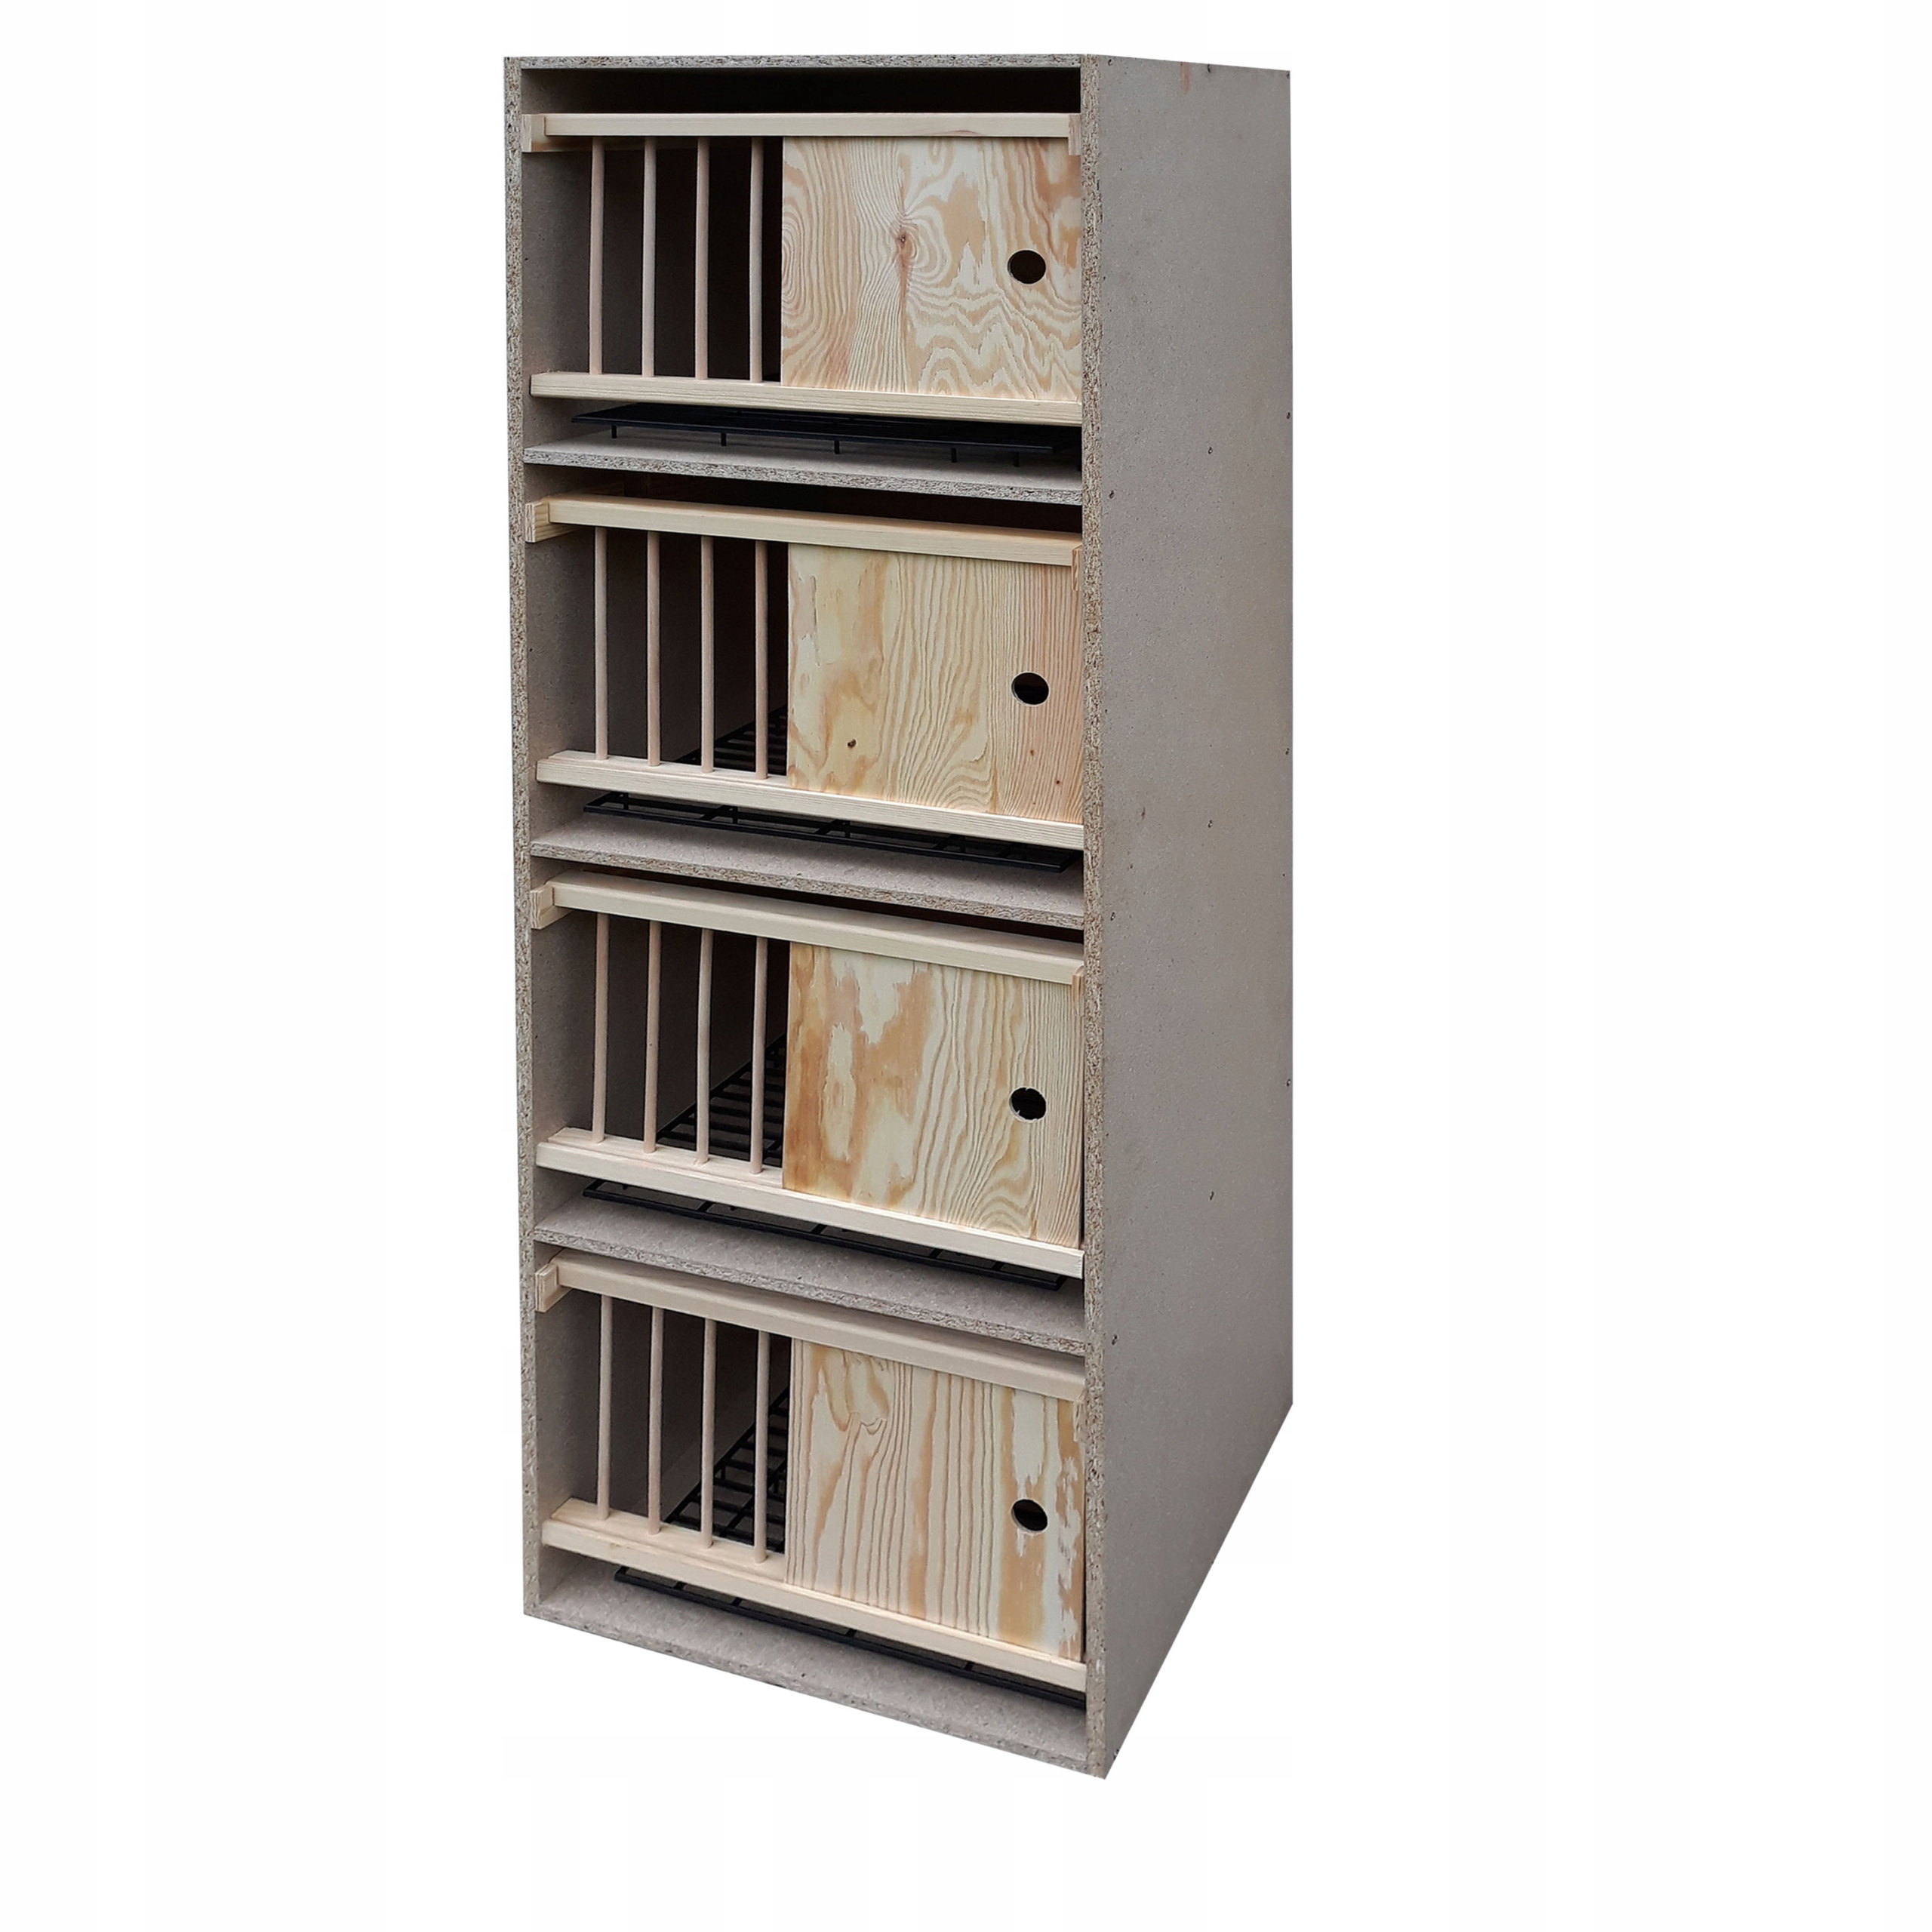 Книжный шкаф Eryk NEW ДСП 150 см